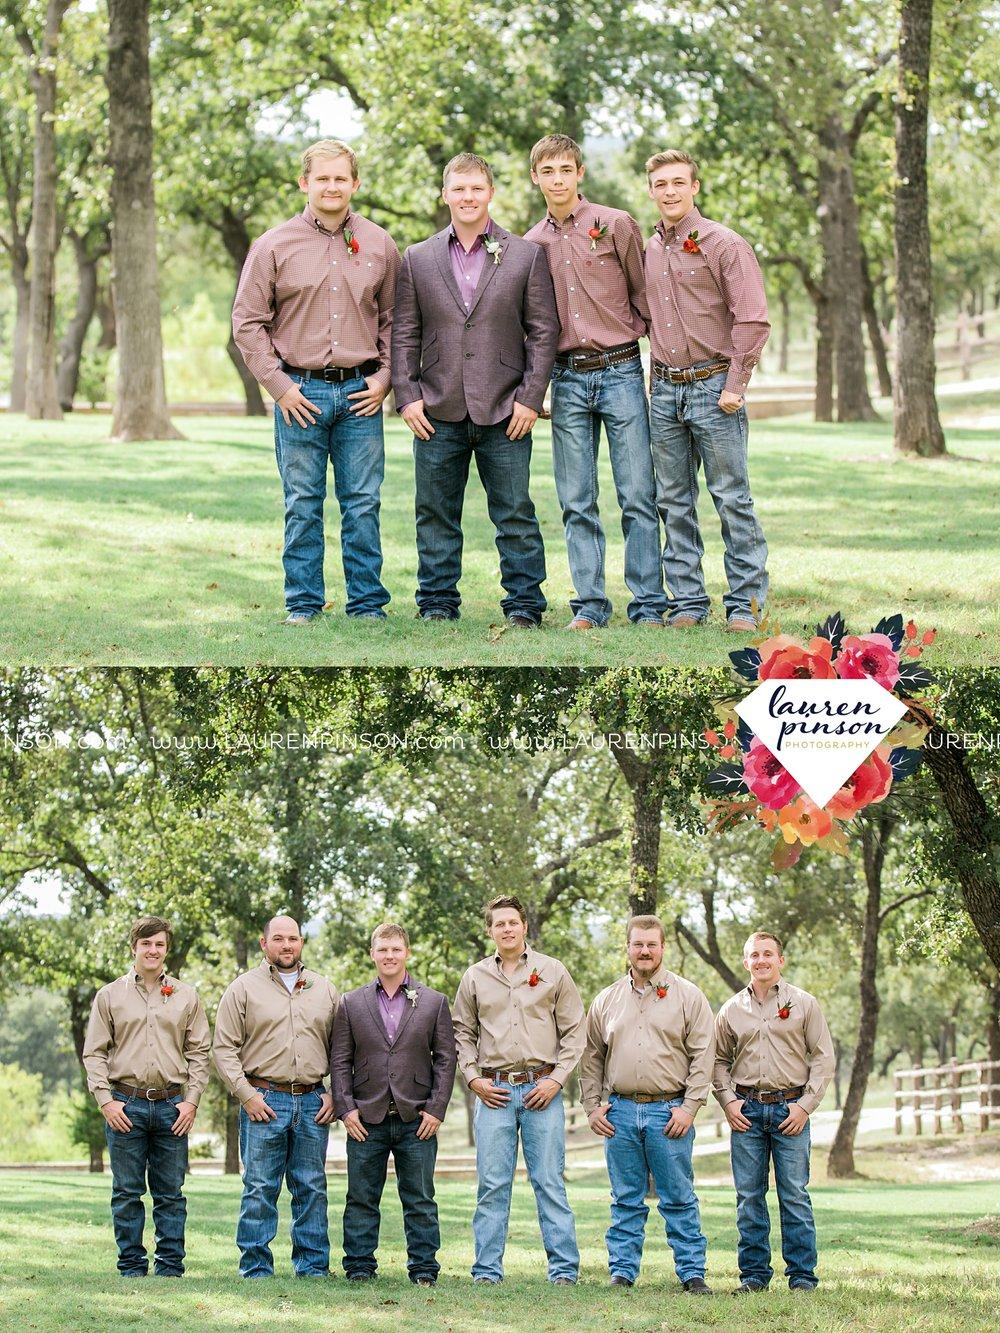 springtown-texas-wedding-at-oak-knoll-ranch-dfw-and-wichita-falls-wedding-photography-lauren-pinson_3540.jpg